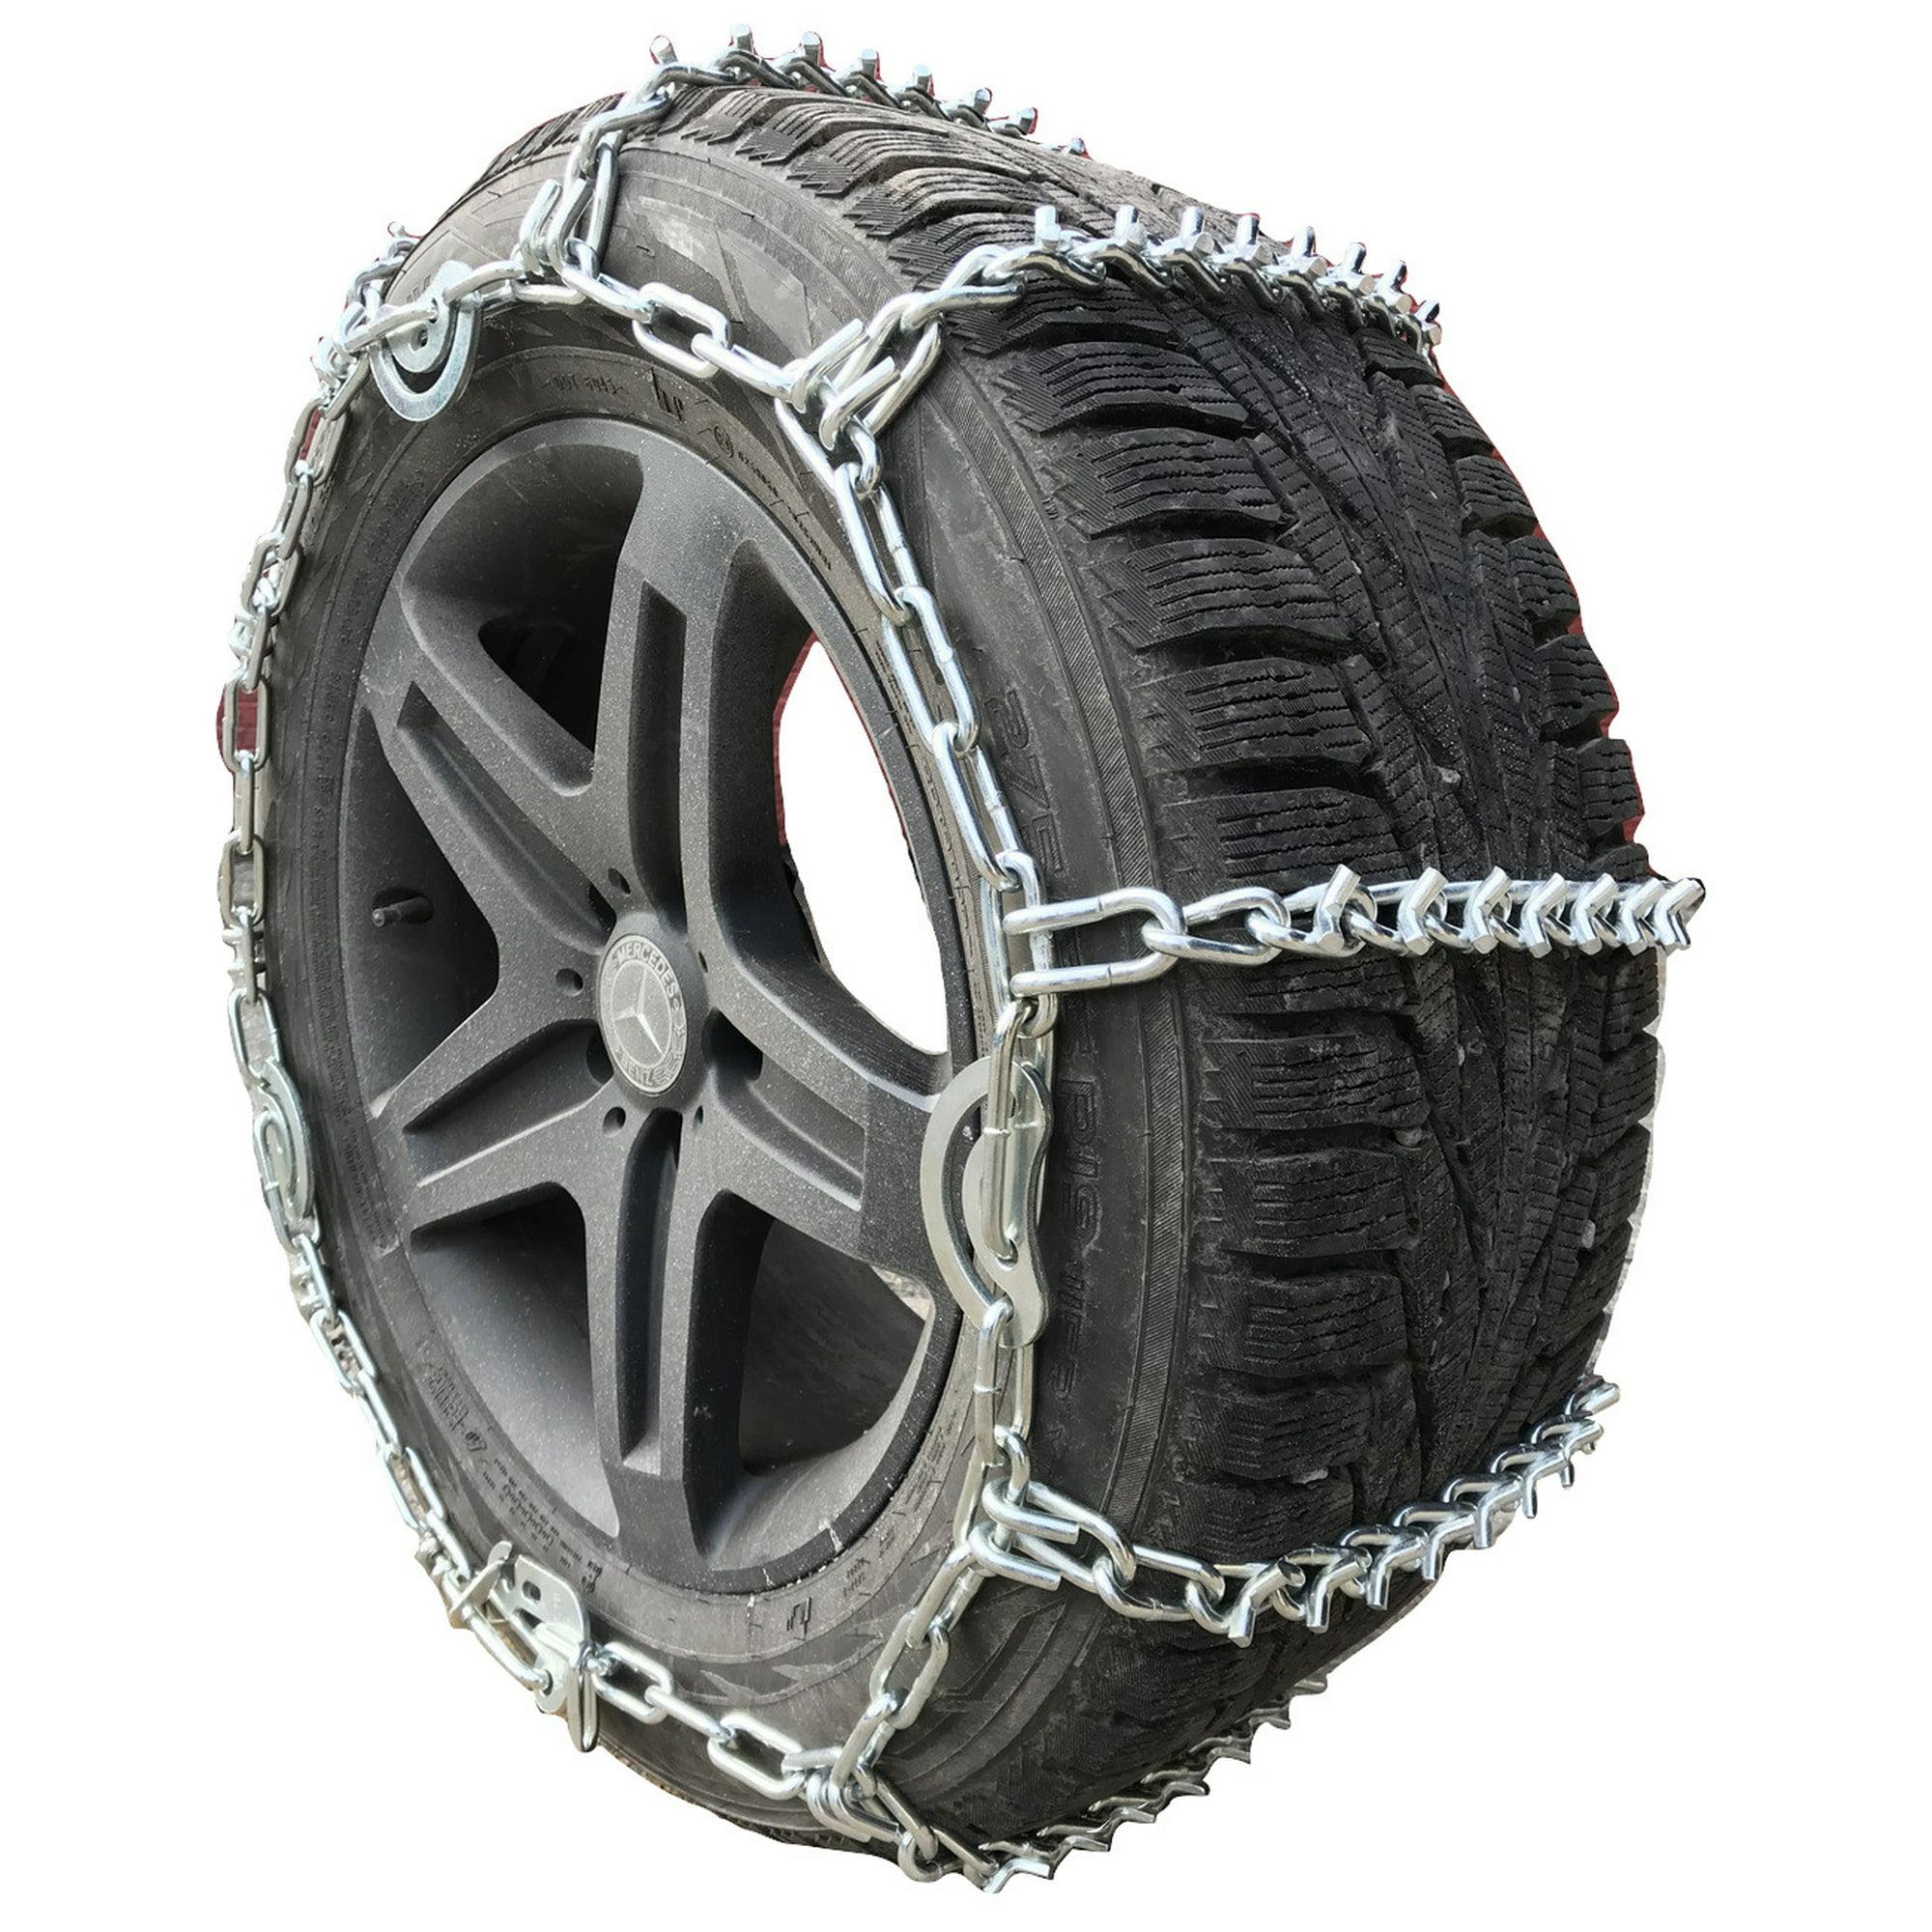 Snow Chains 38X12 50-16 5 Boron ALLOY Cam V-BAR Tire Chains